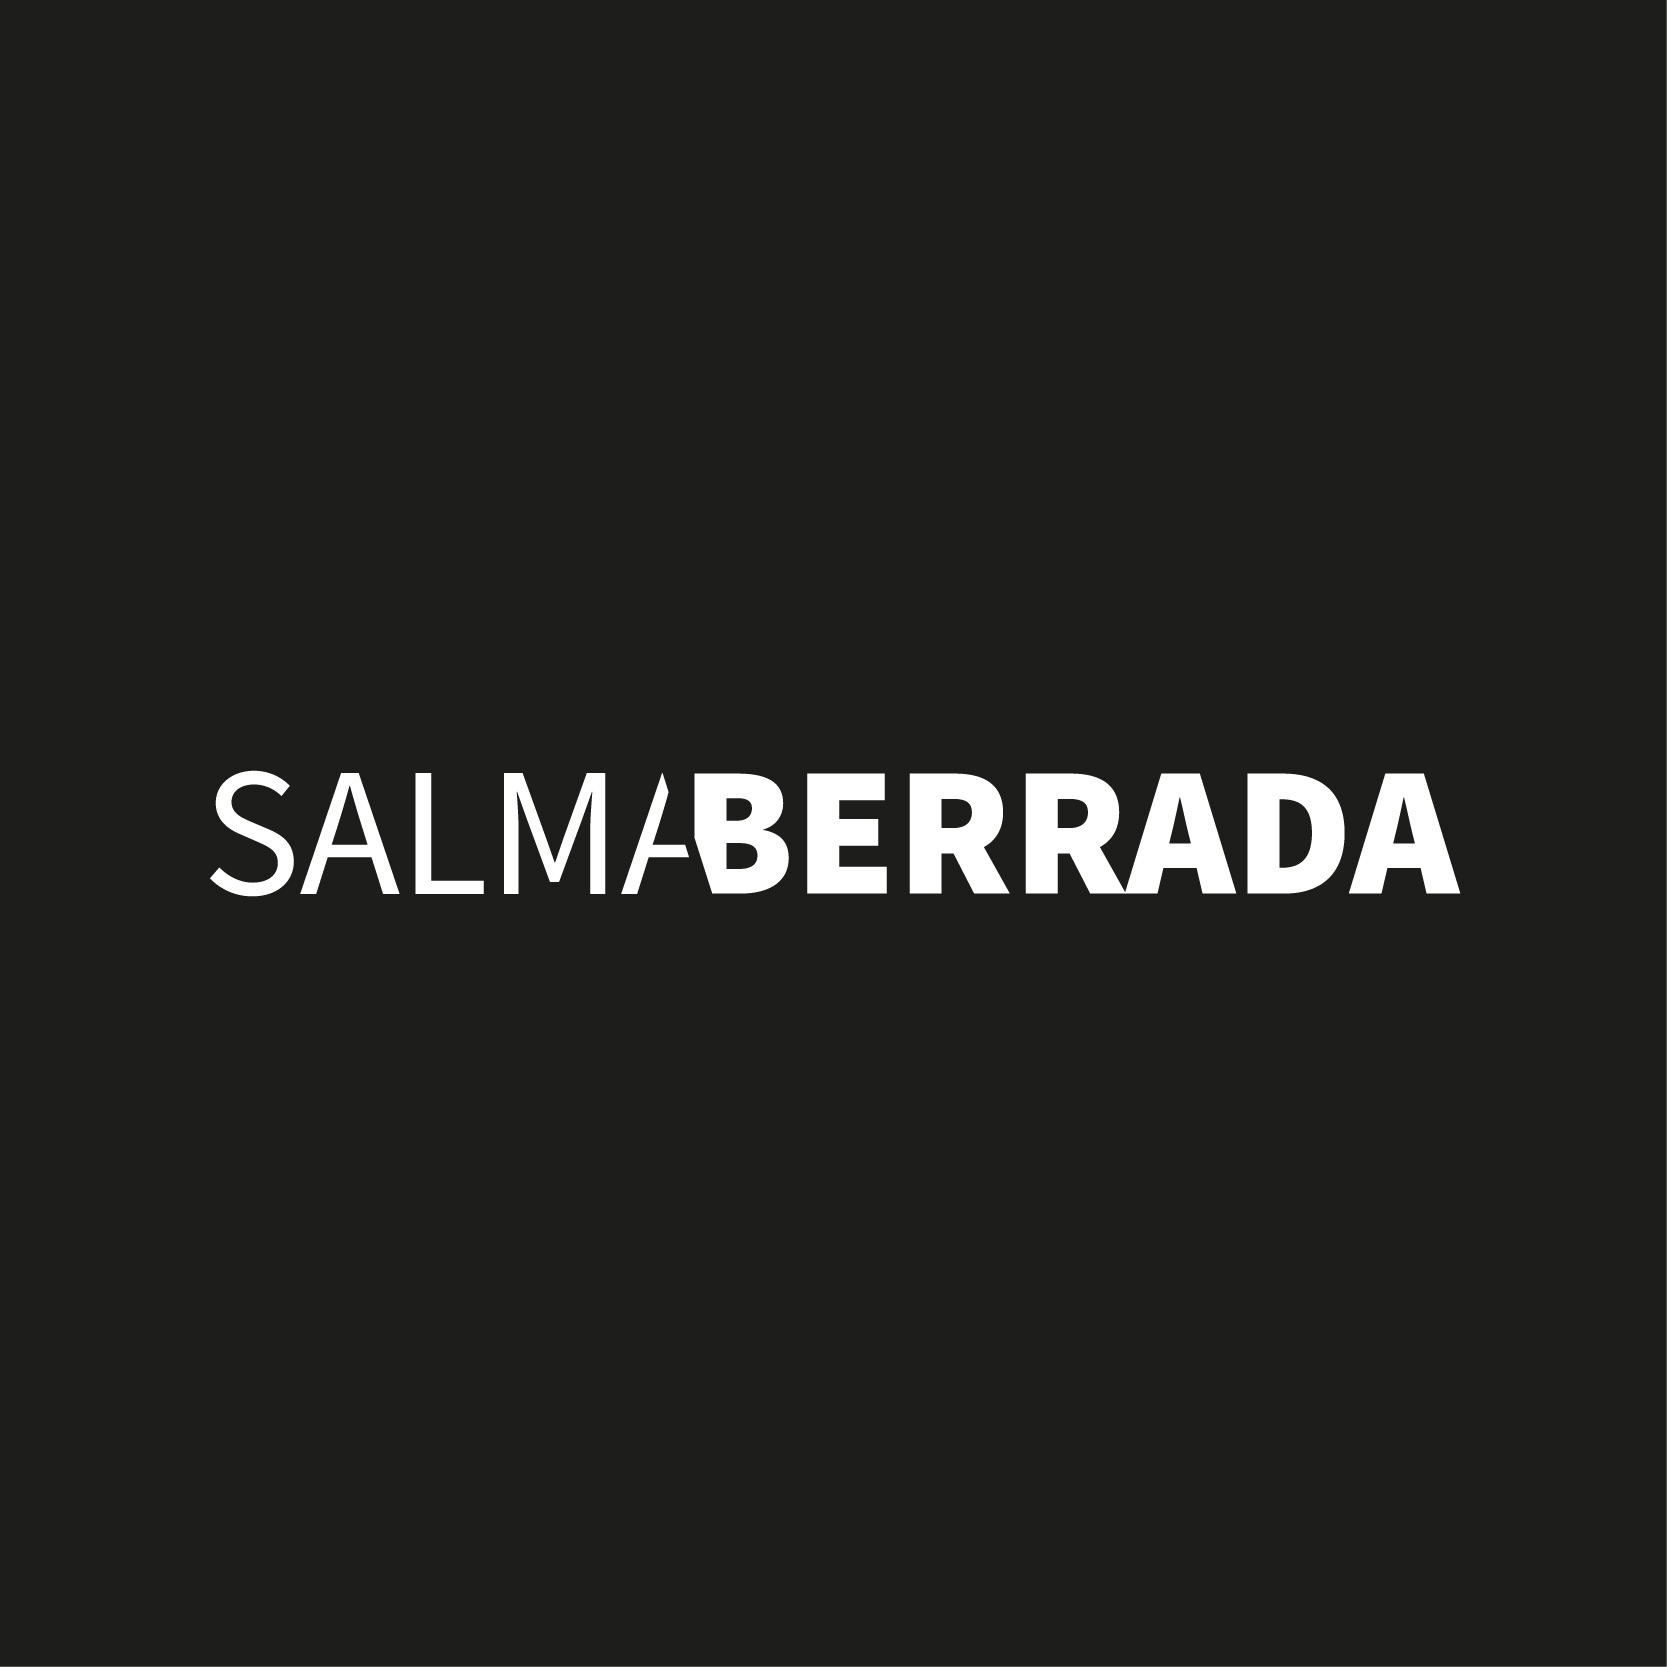 logo_Salma_negatif_light